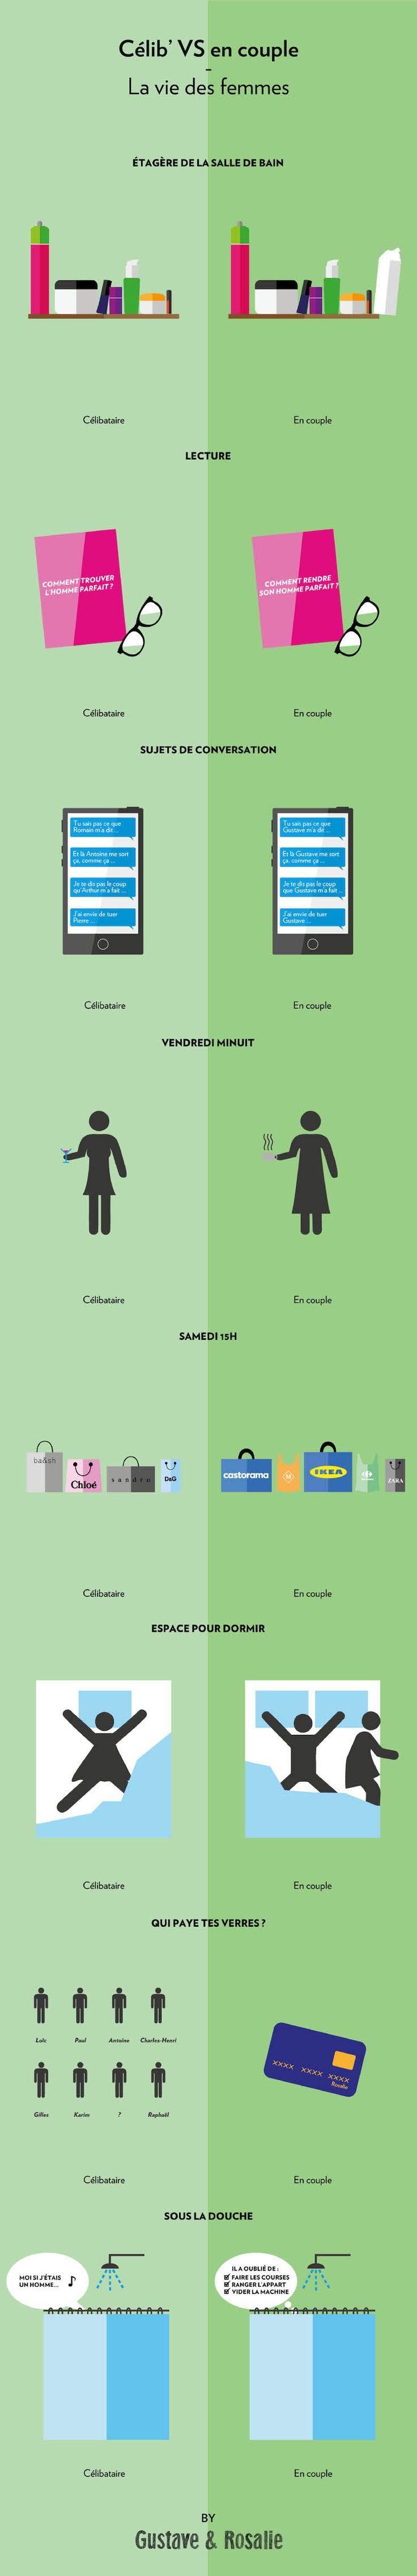 femme-celibatiare-vs-femme-couple-difference-illustre-1